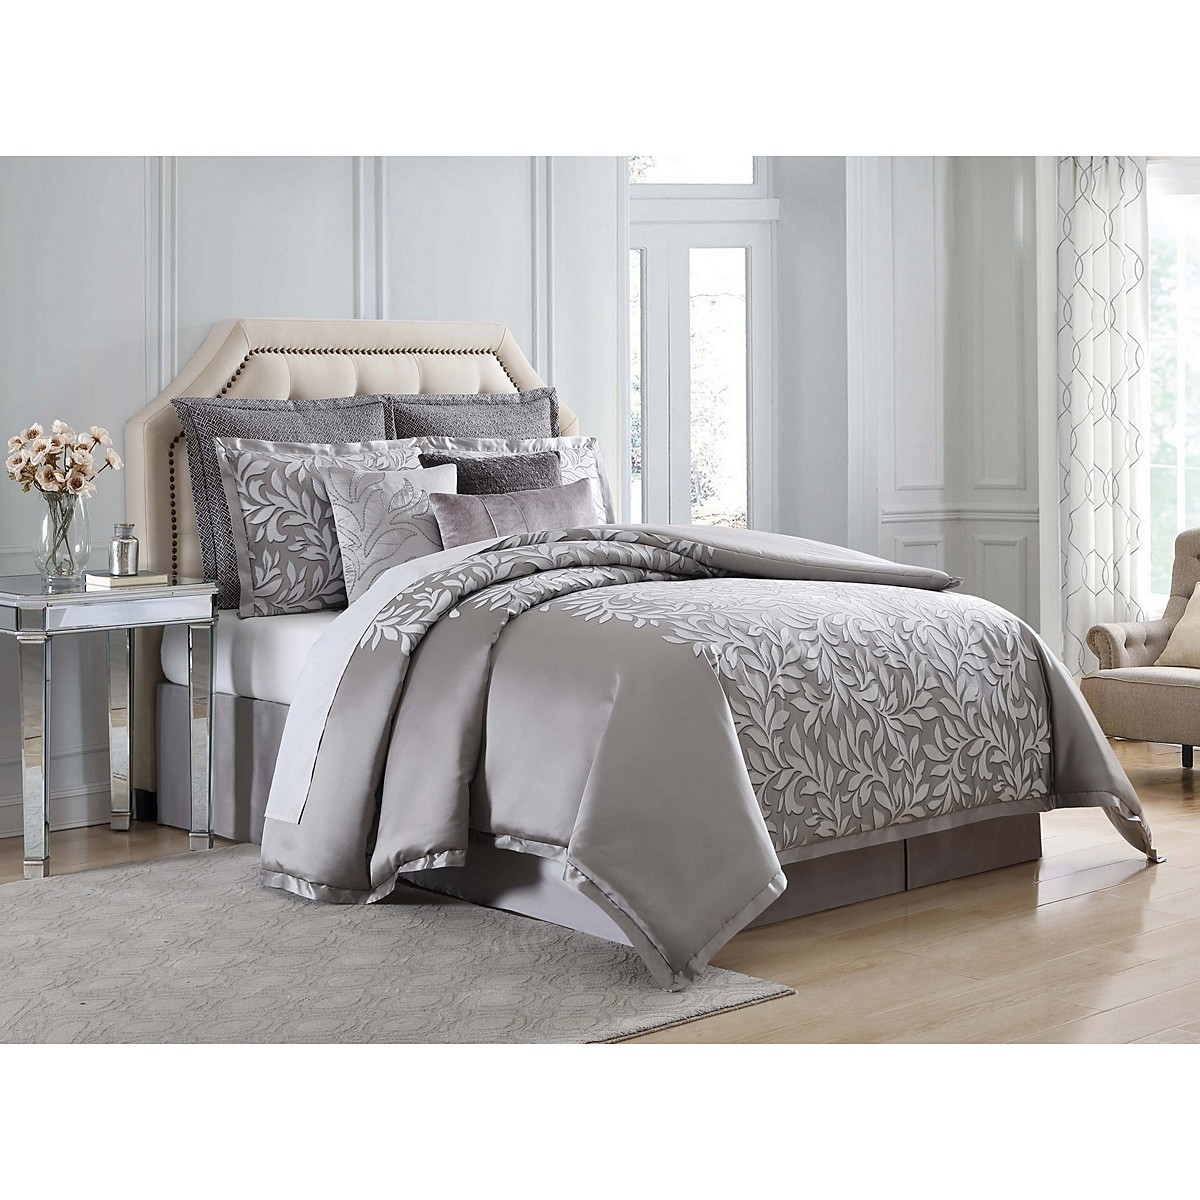 aetherair queen comforters lacoste bloomingdales bed co asli sheets comforter